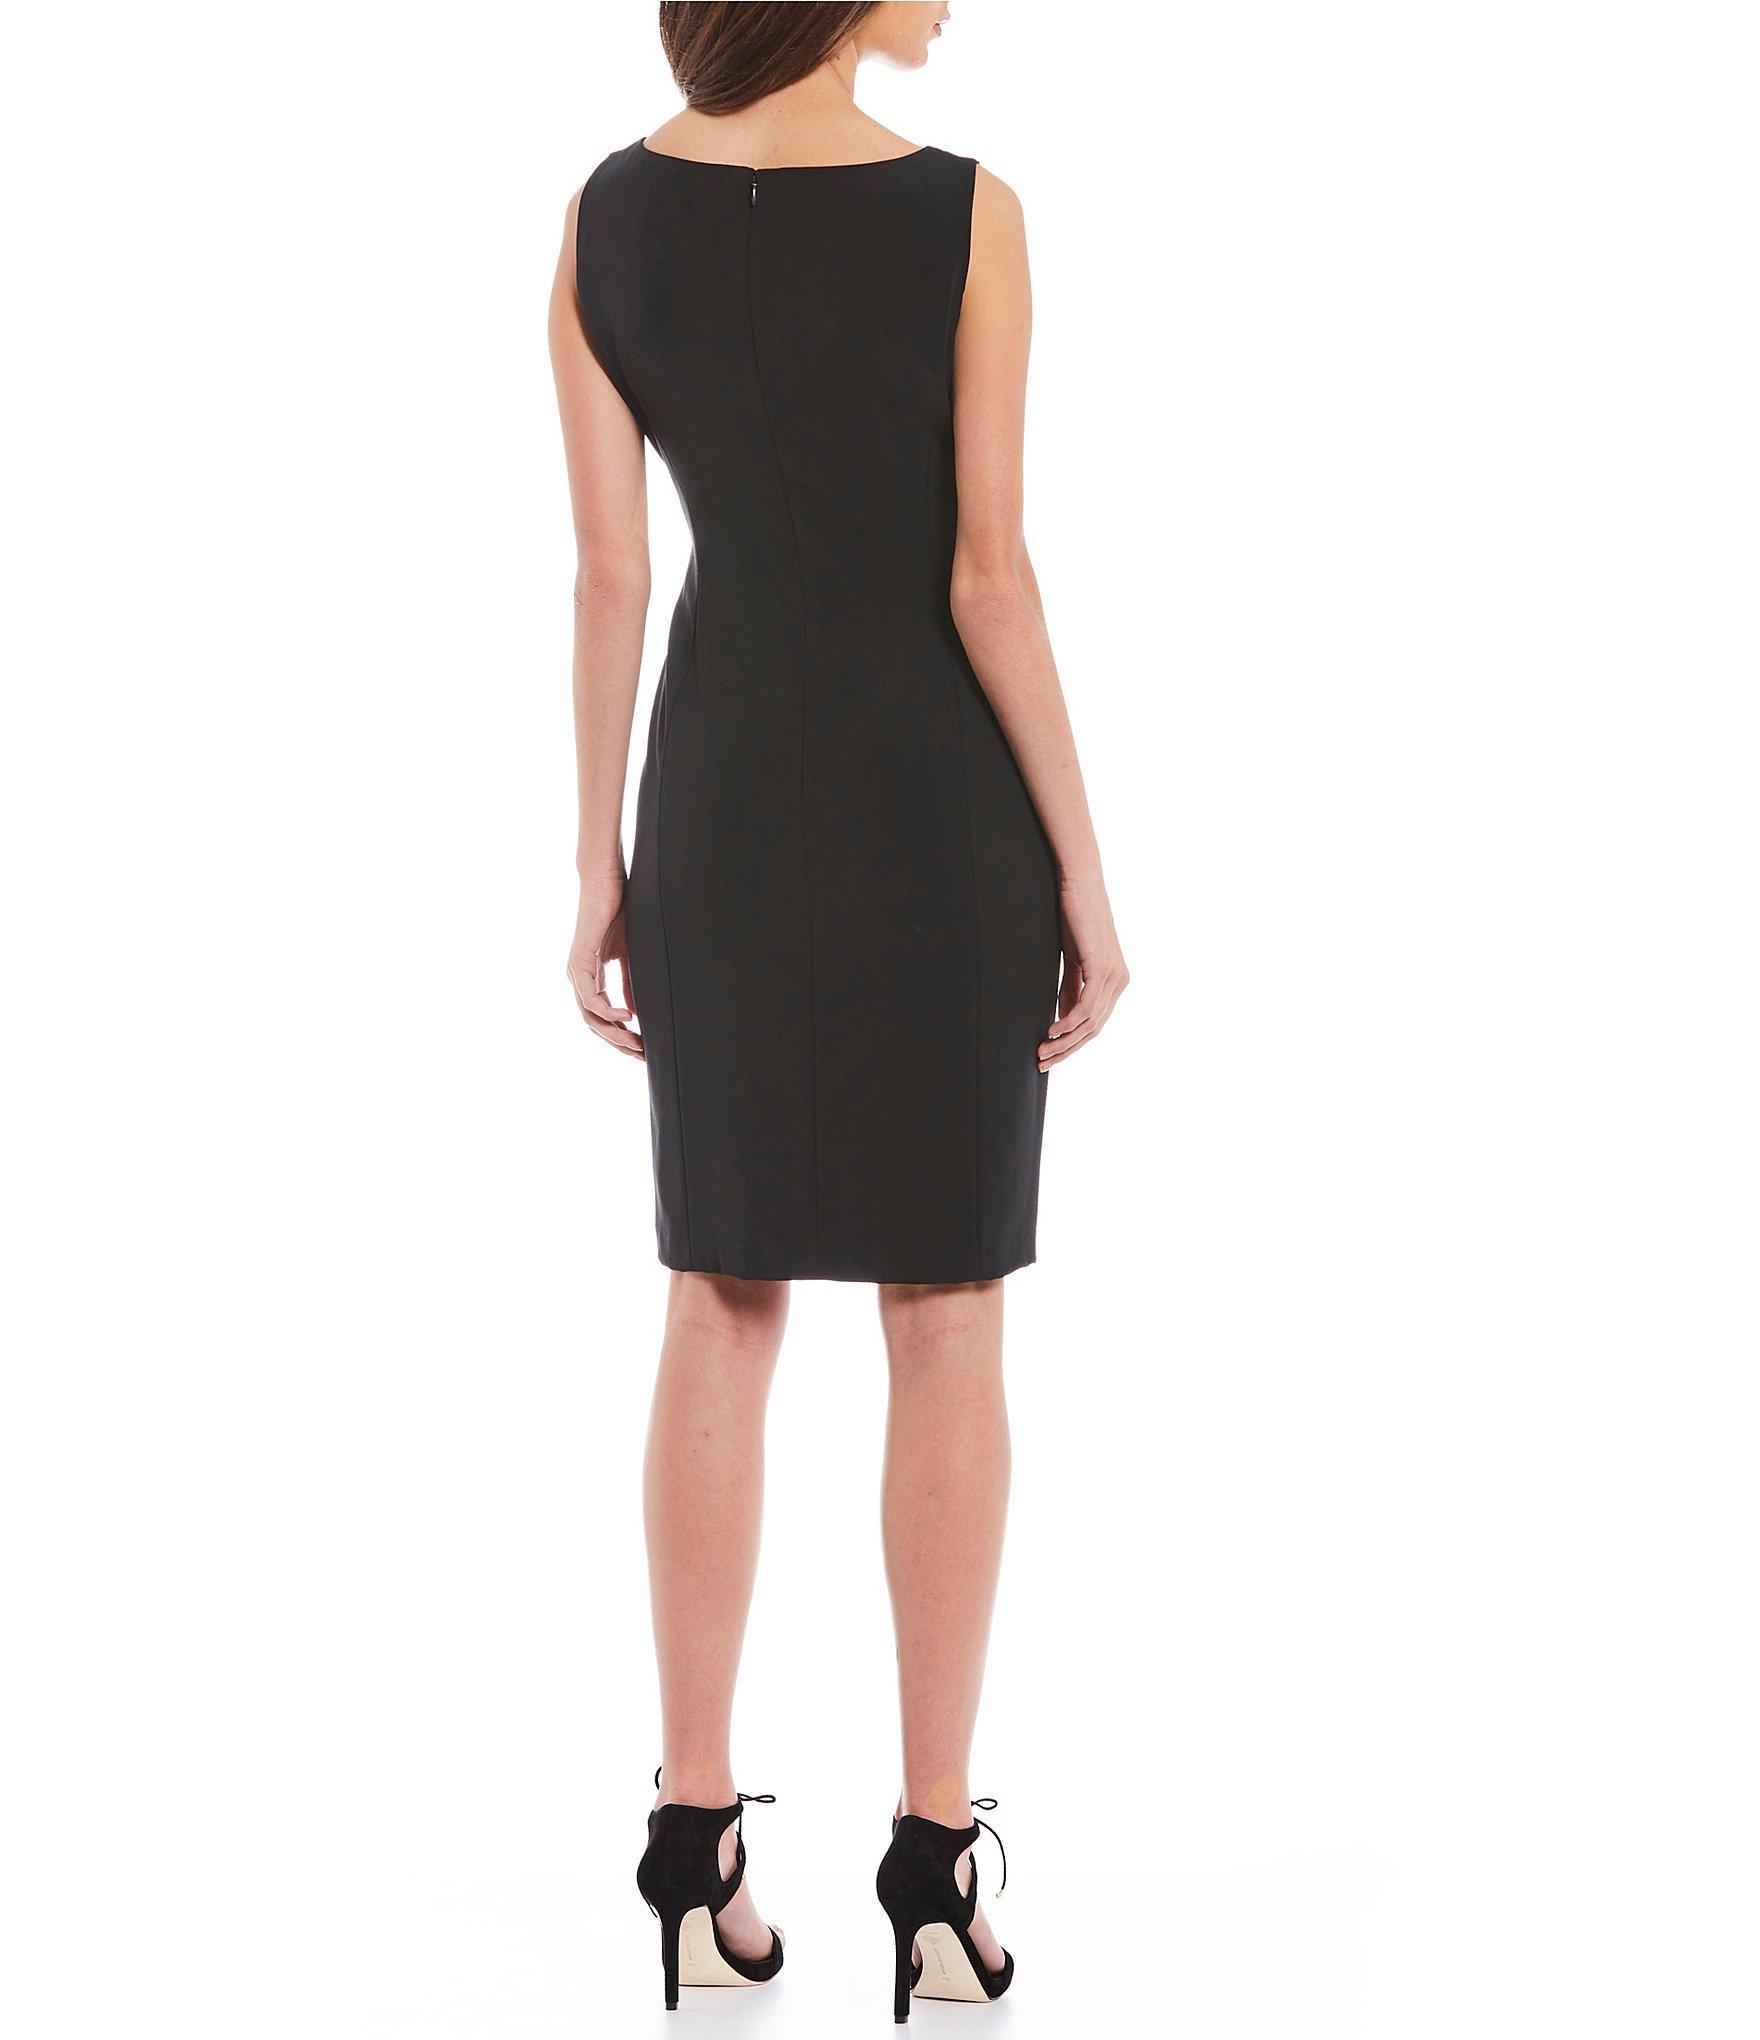 f08bc782847 Antonio Melani - Black Cynthia Sleeveless Sheath Dress - Lyst. View  fullscreen